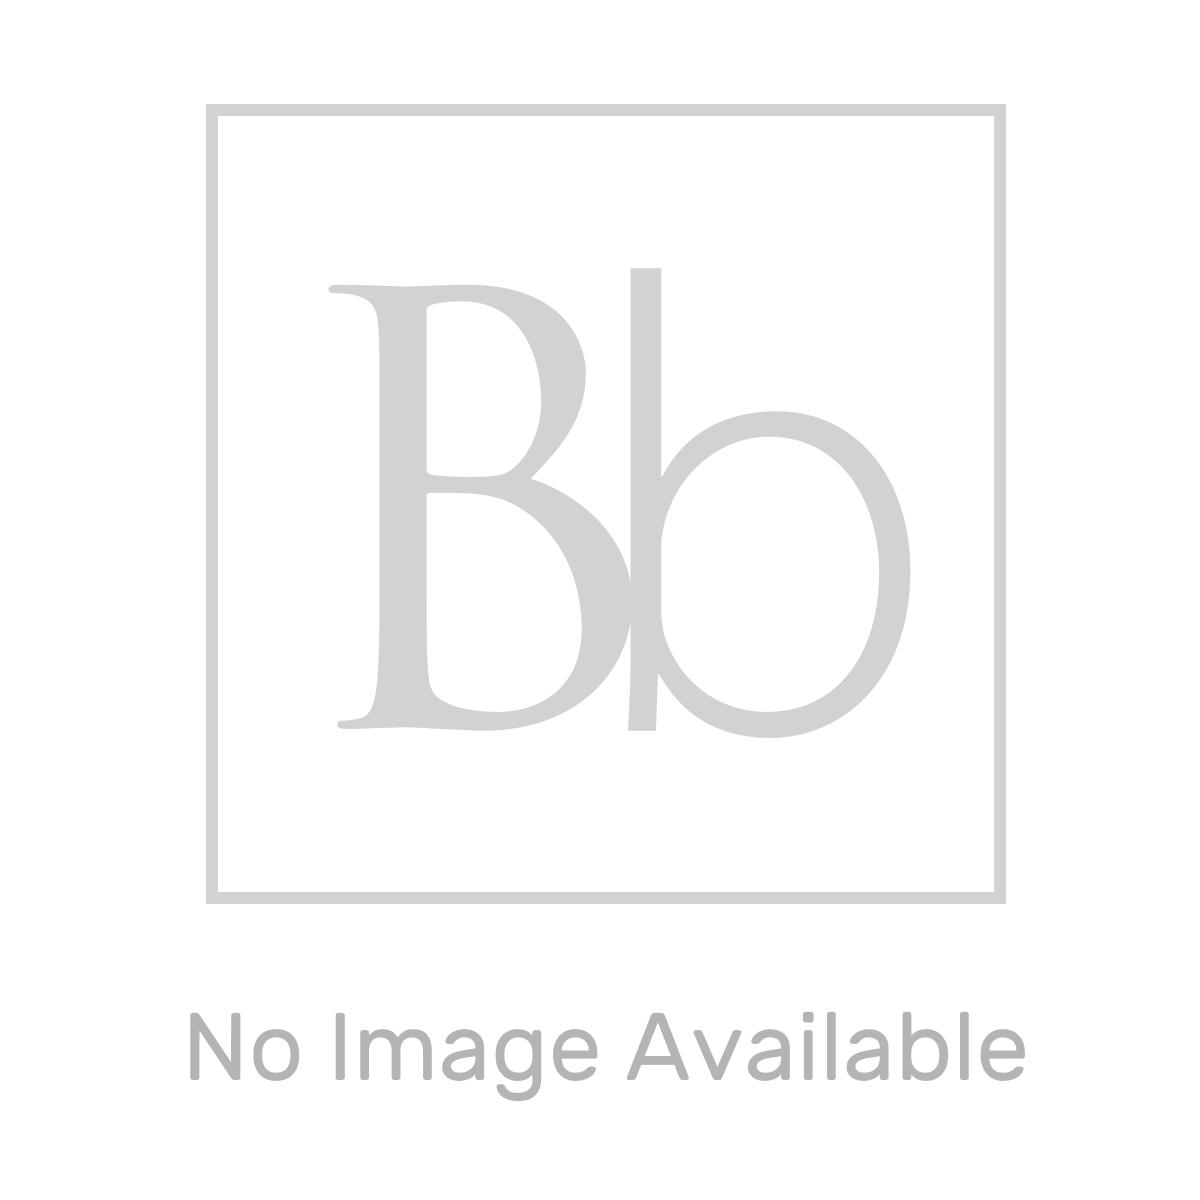 Moods Plain White Deluxe Acrylic Bath Panel 1700mm